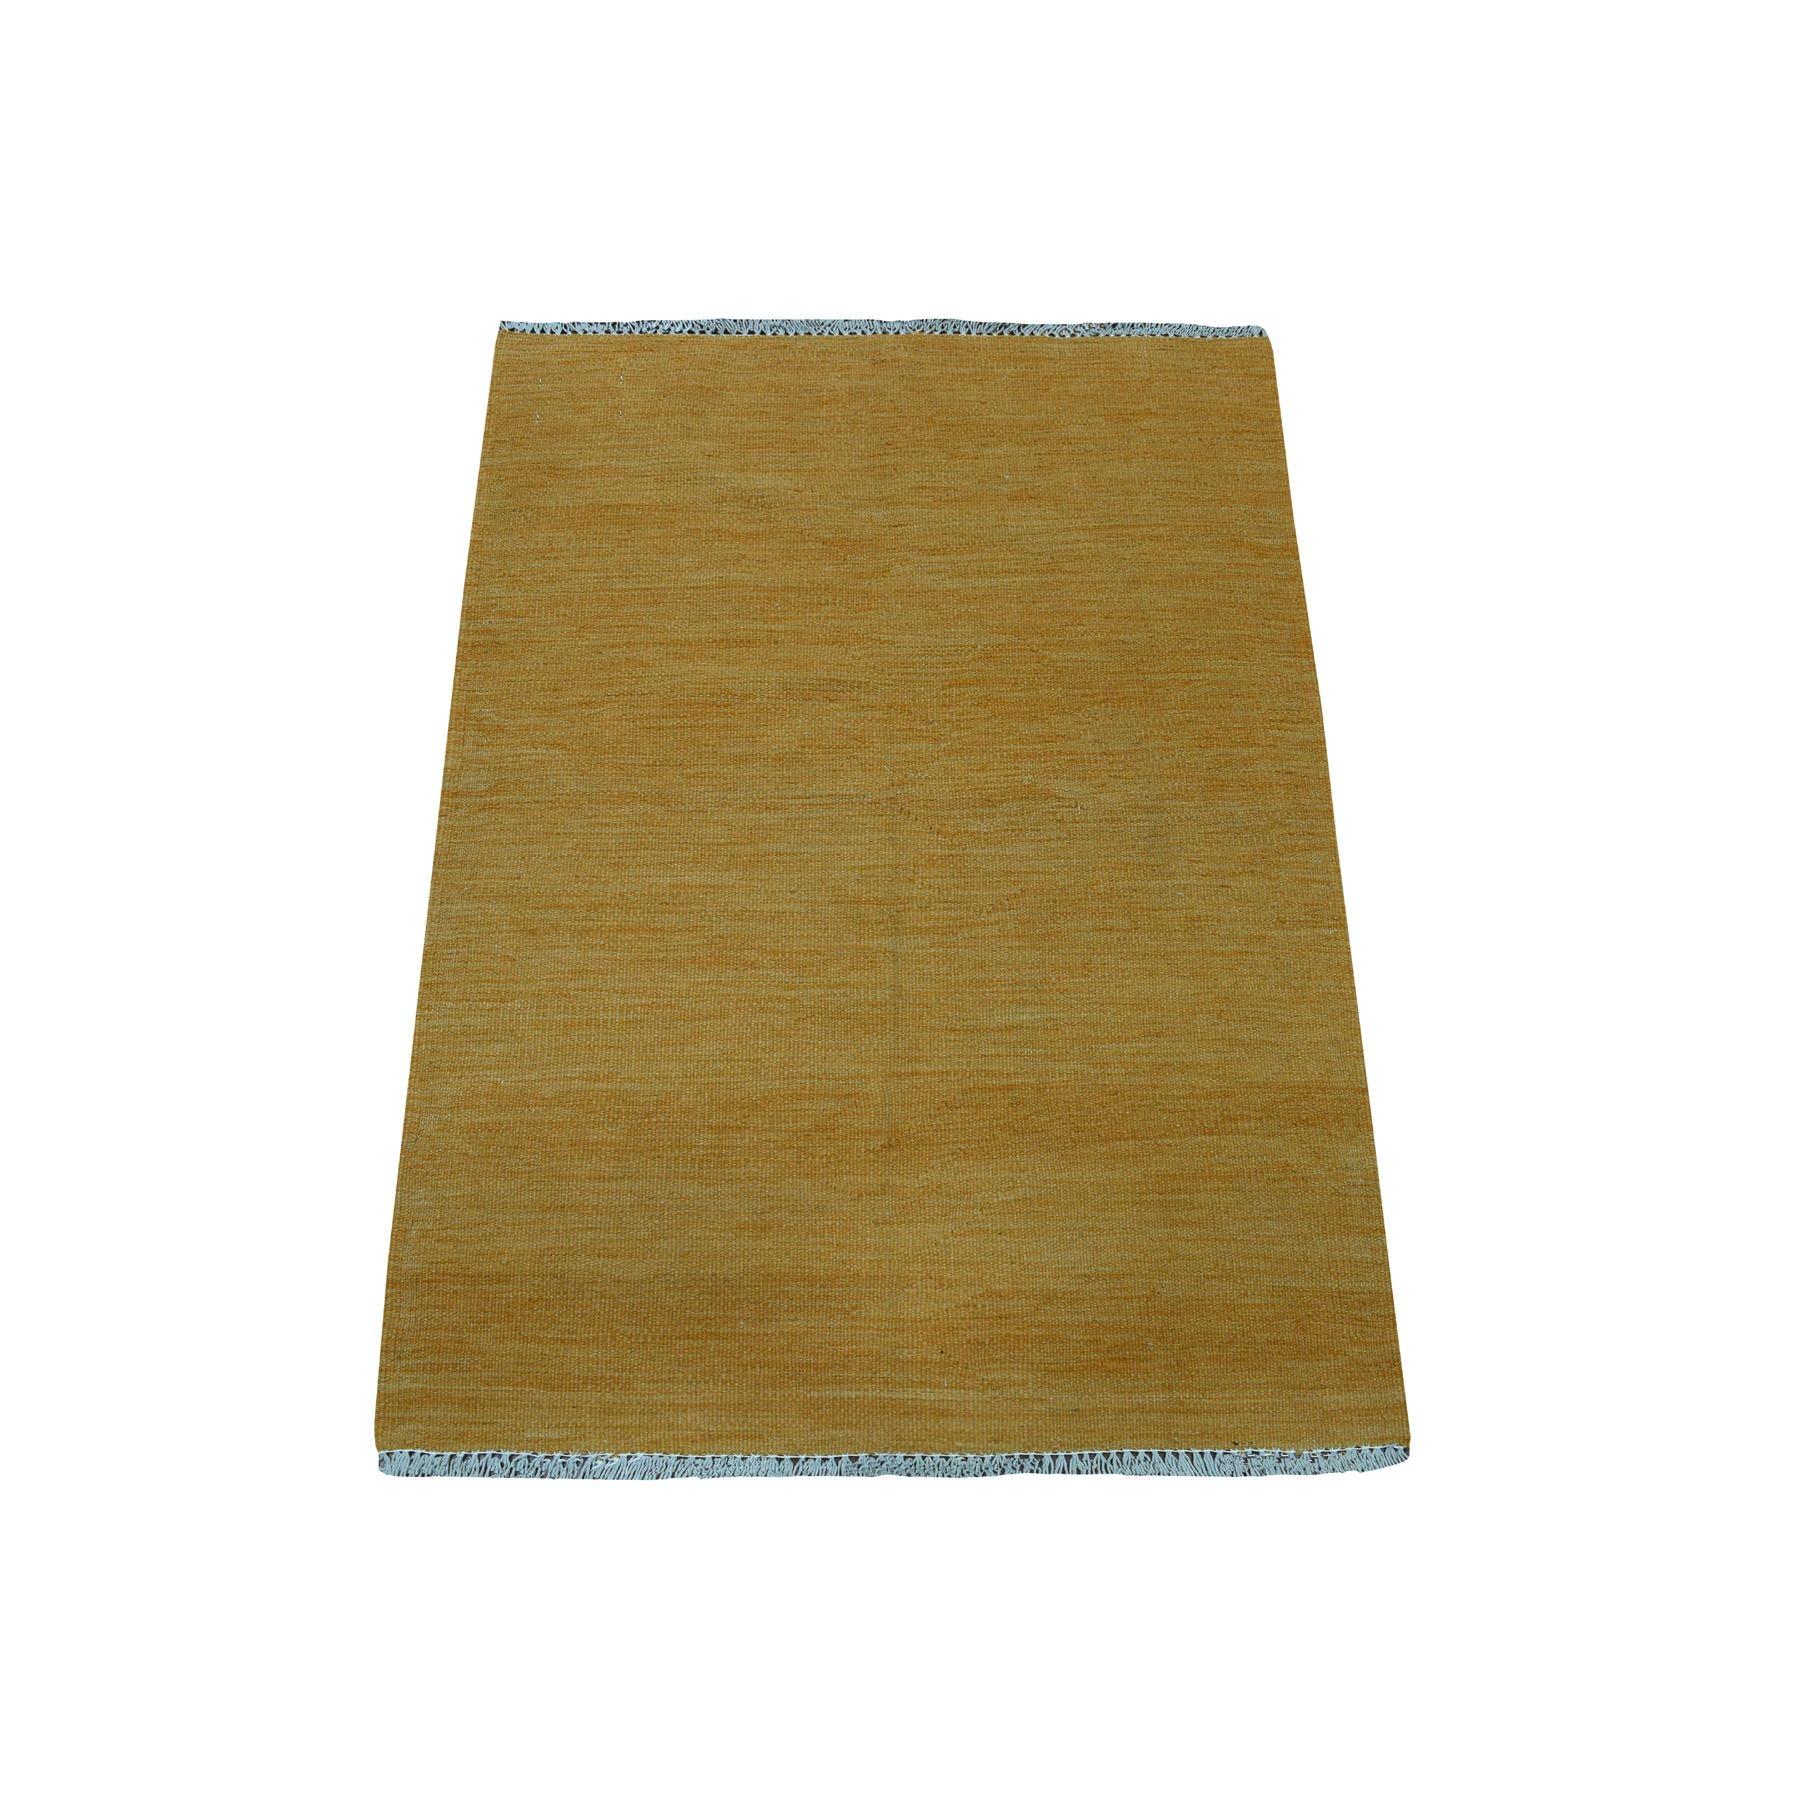 Fine Kilim Collection Hand Woven Yellow Rug No: 01108504